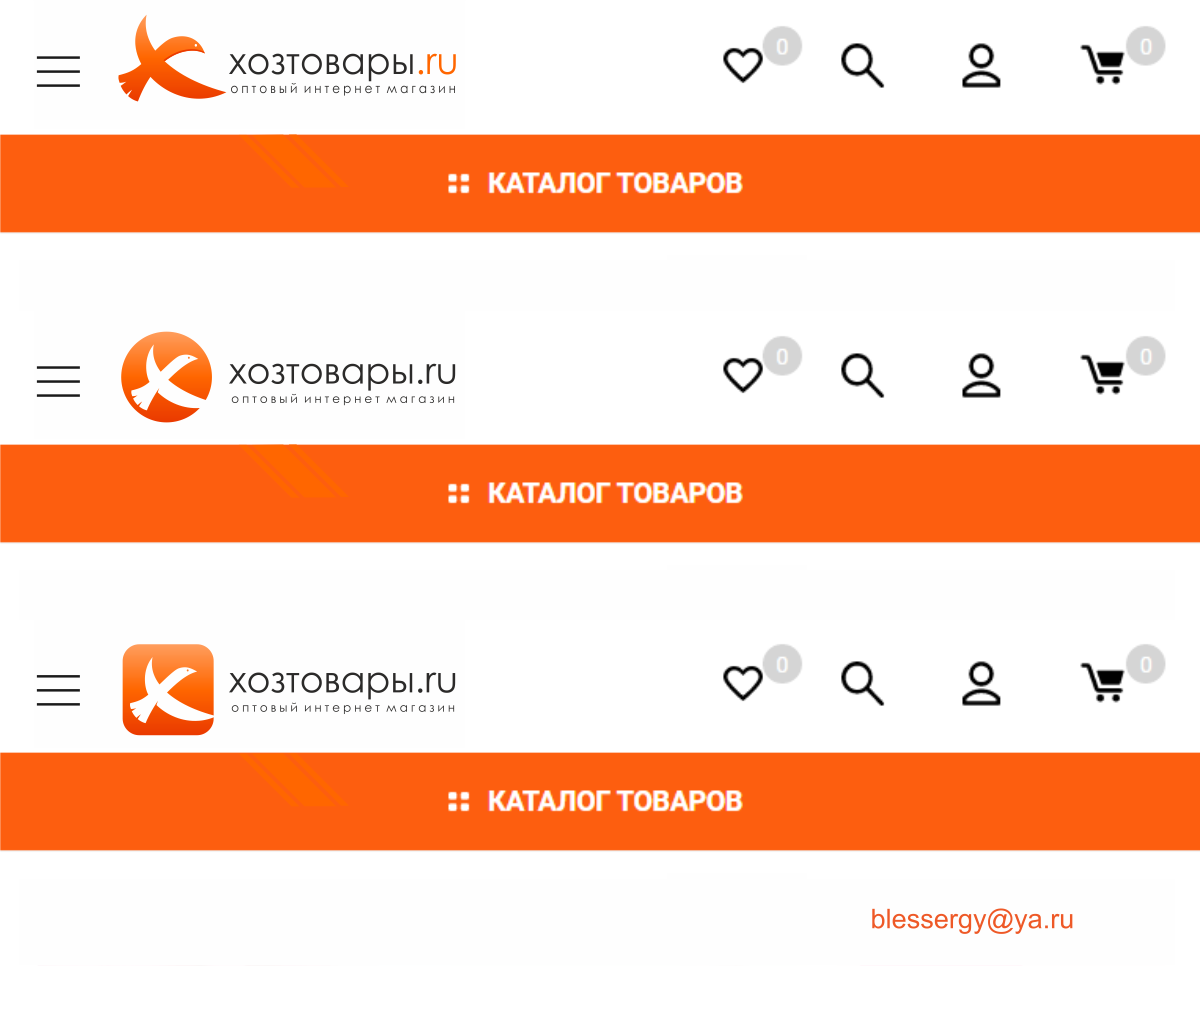 Разработка логотипа для оптового интернет-магазина «Хозтовары.ру» фото f_23960778f1e4eb8a.png